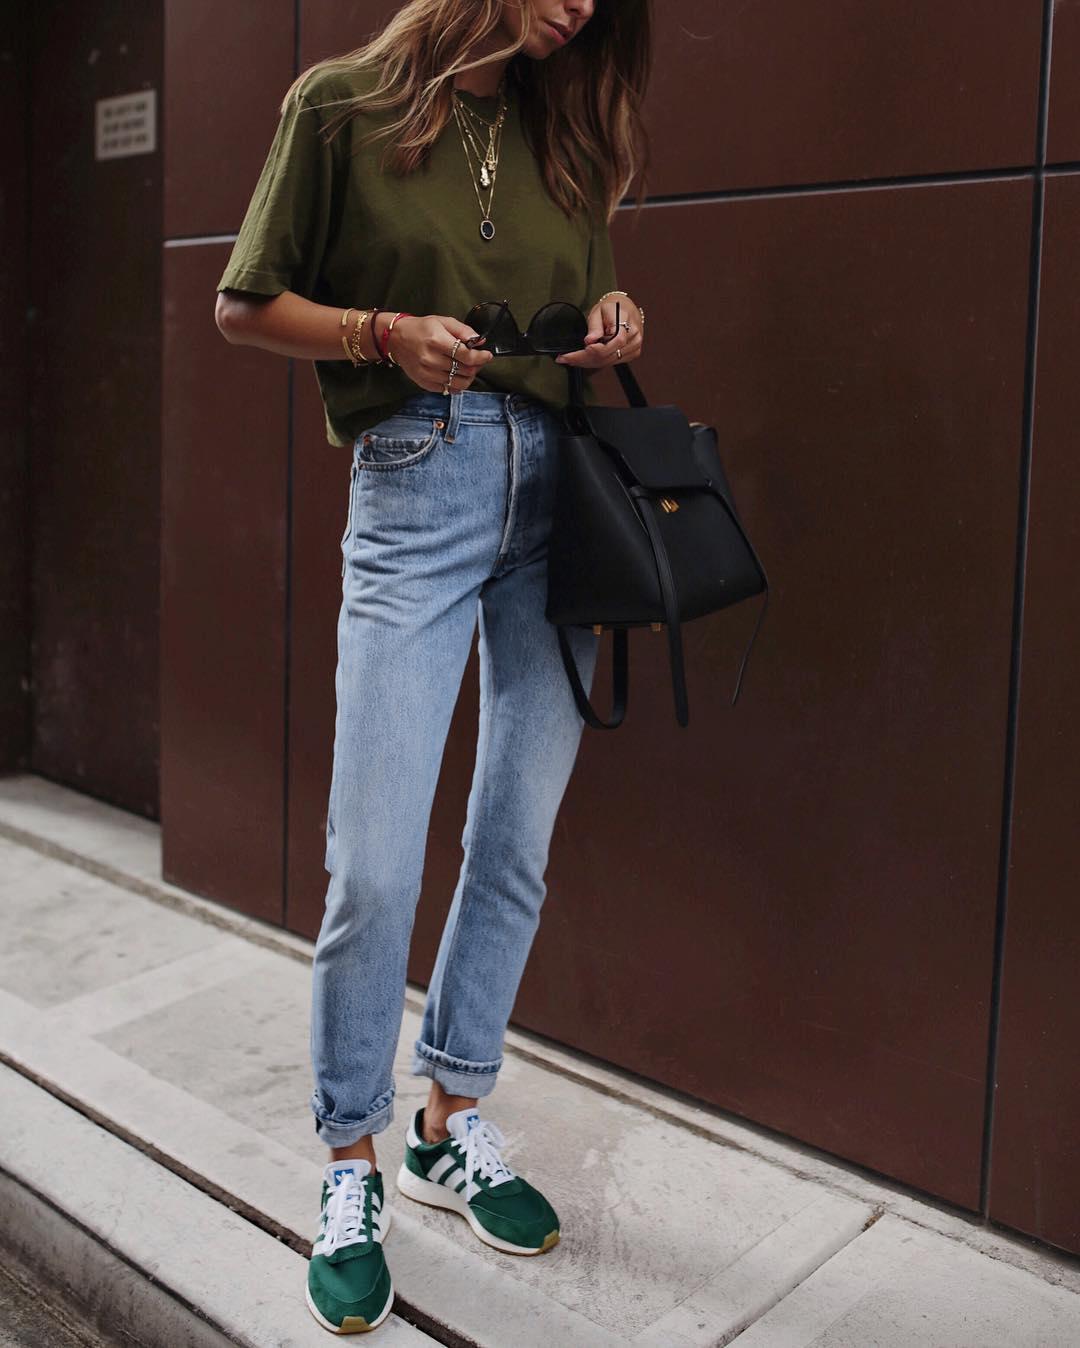 джинсы и футболка фото 7